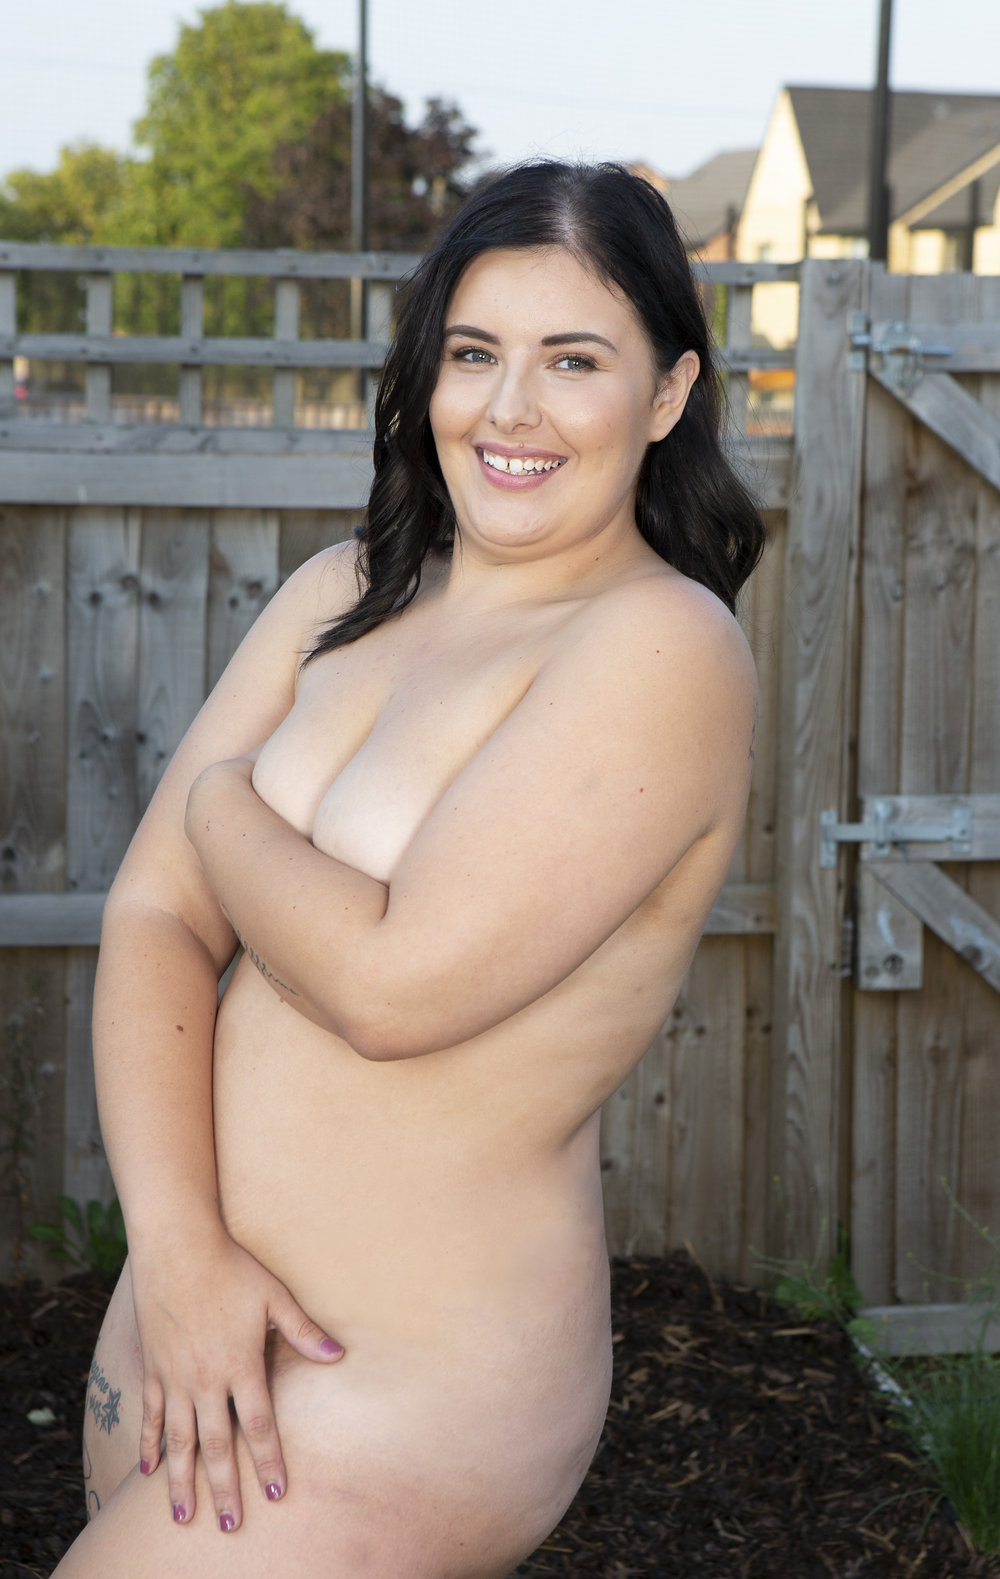 https://www.dailymail.co.uk/femail/article-5952343/Naked-sunbathing-women-views-enjoying-weather-au-naturel.html